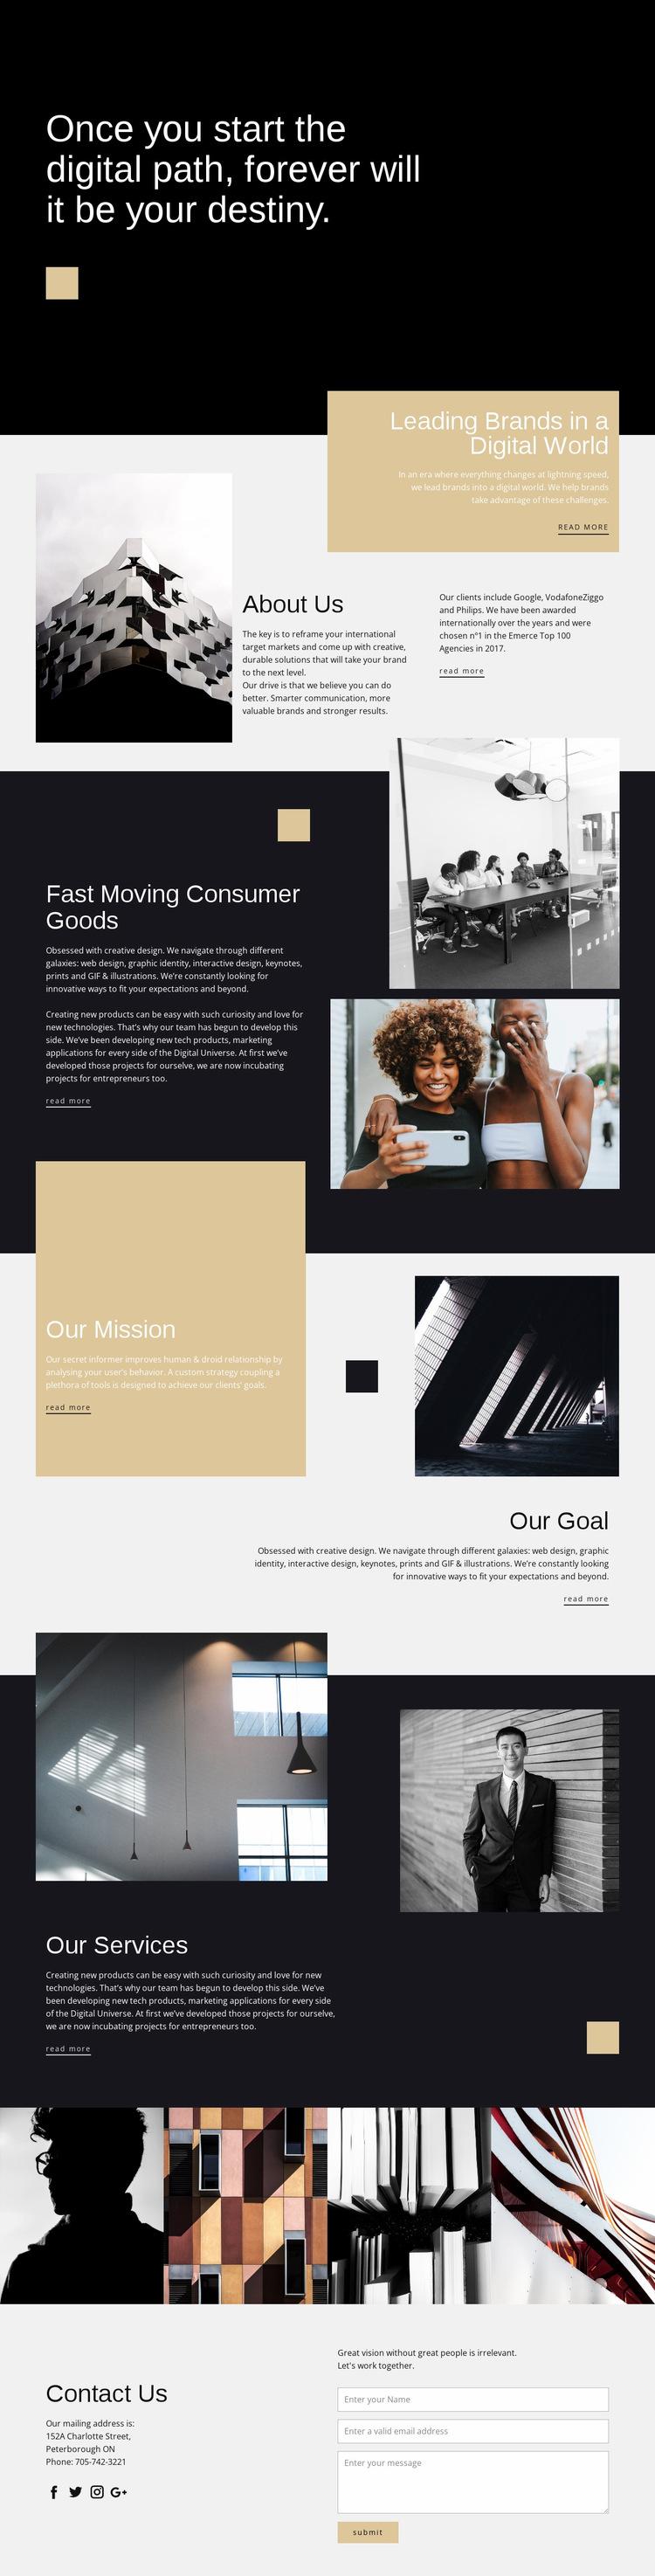 Destiny photo studio Website Builder